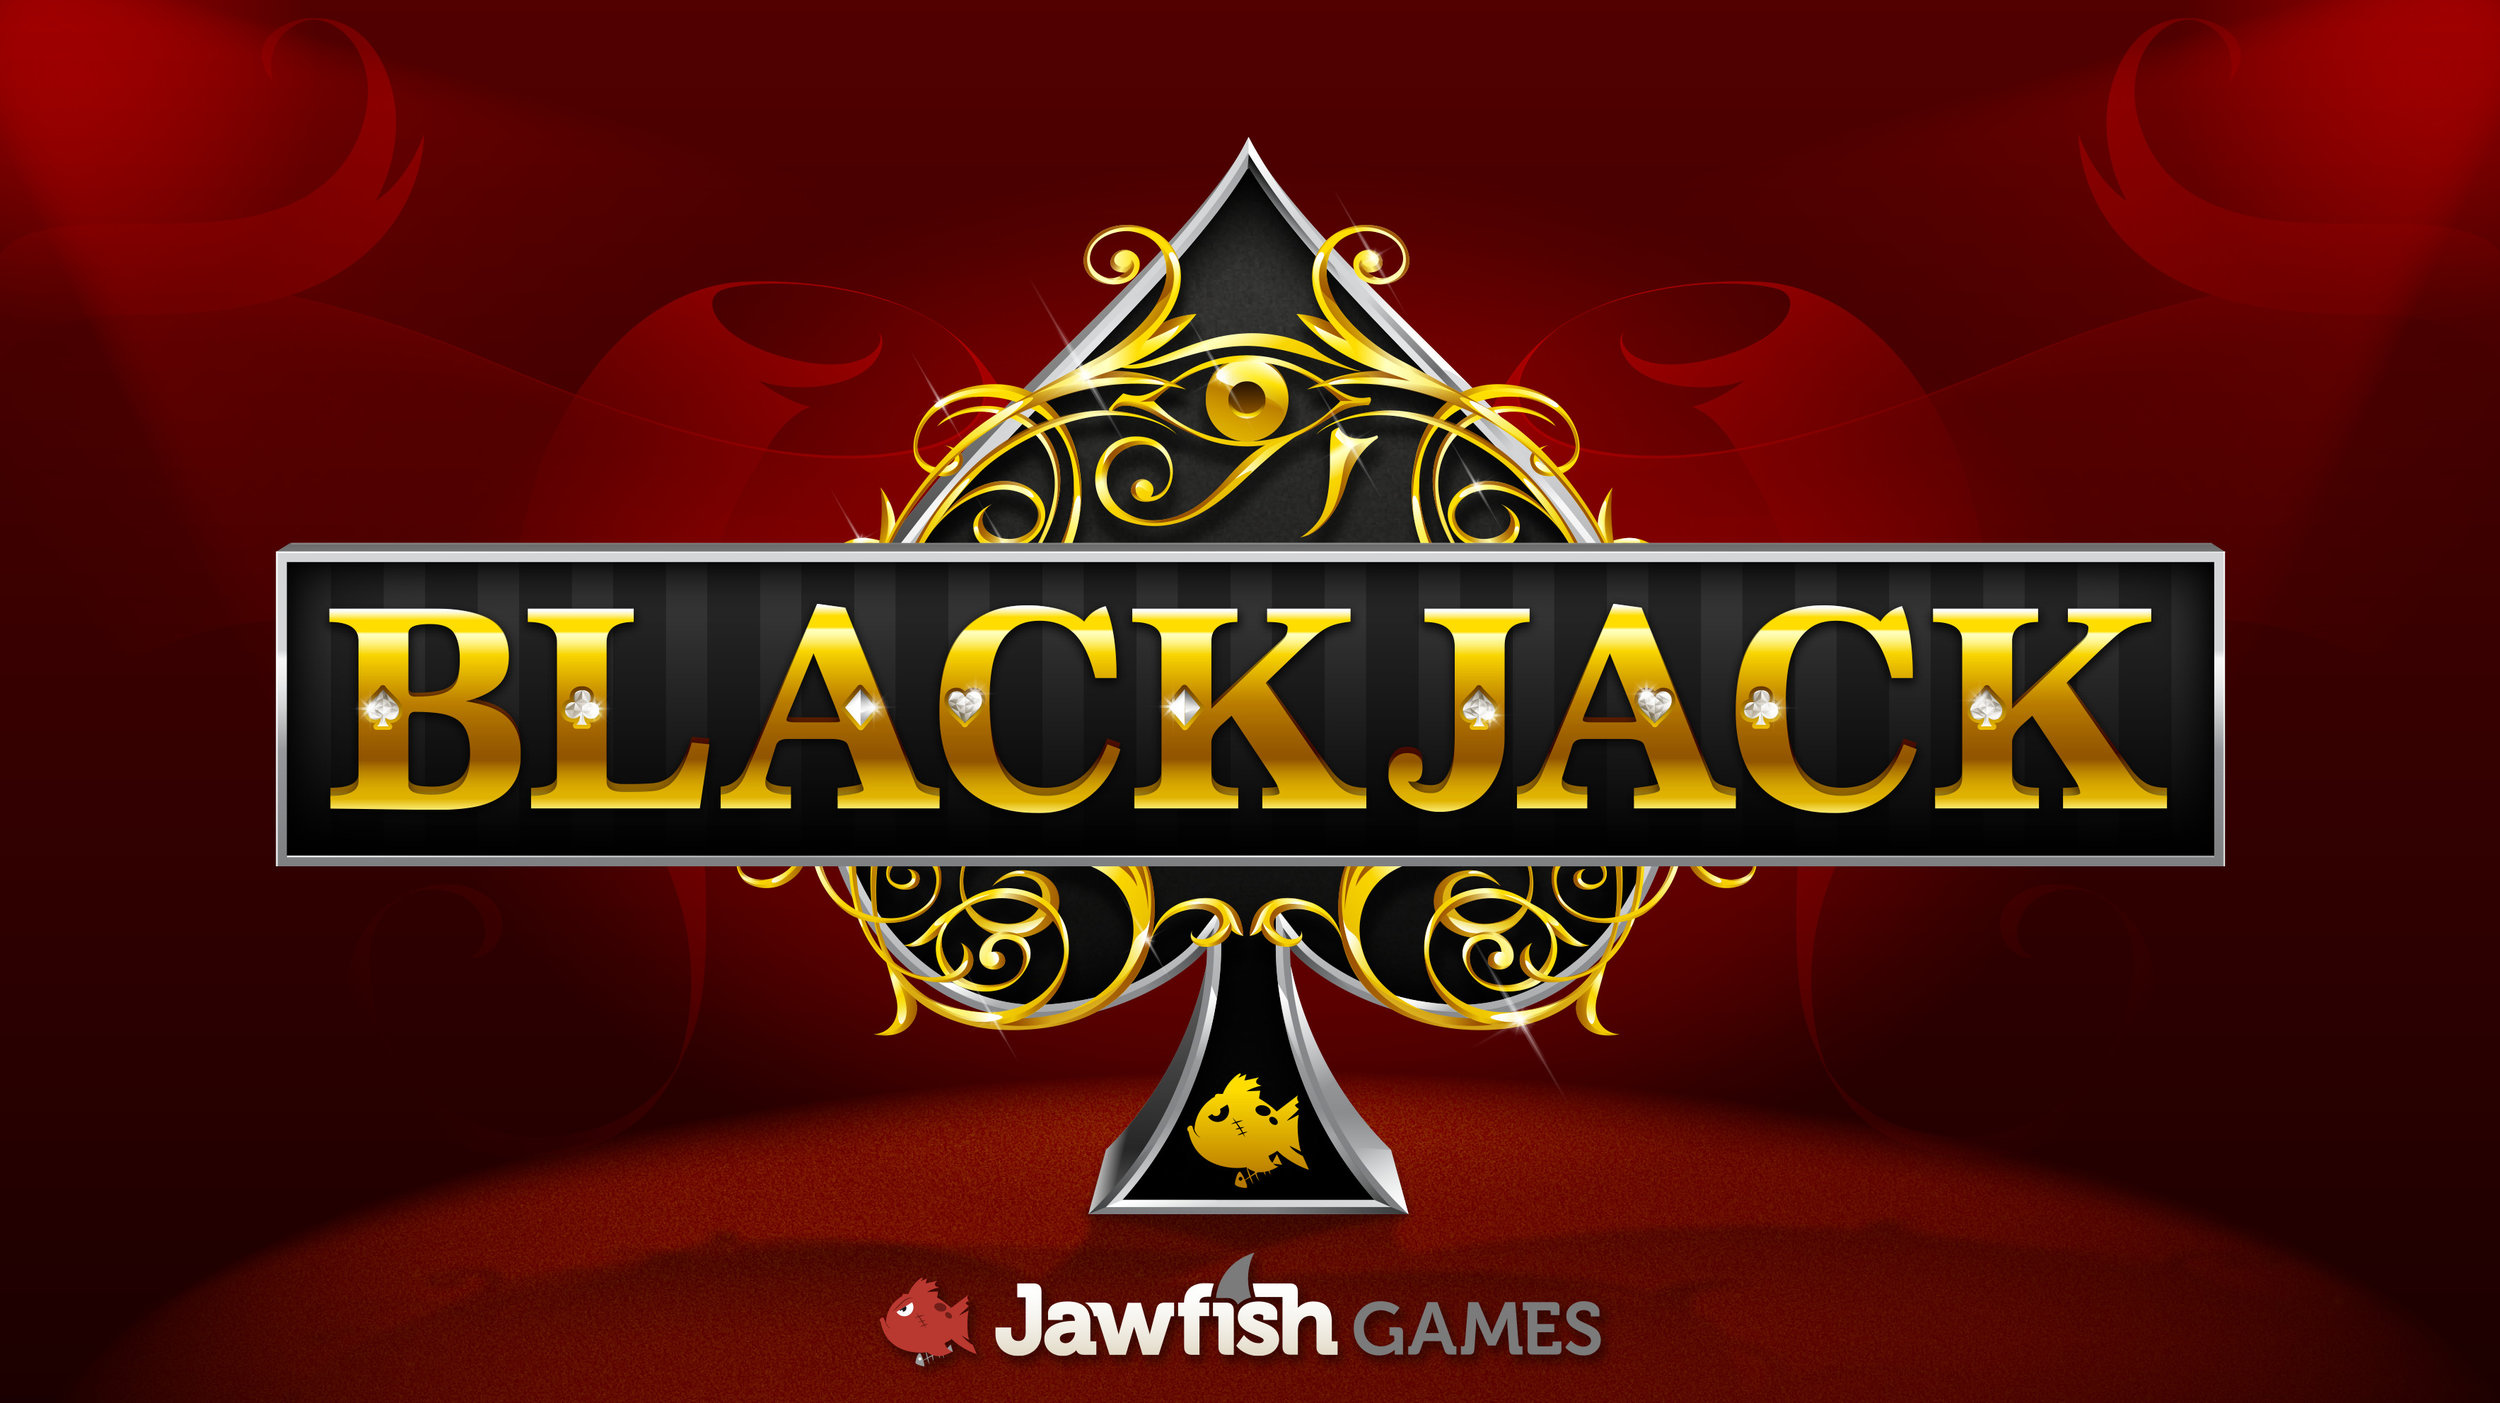 BlackJack01.jpg